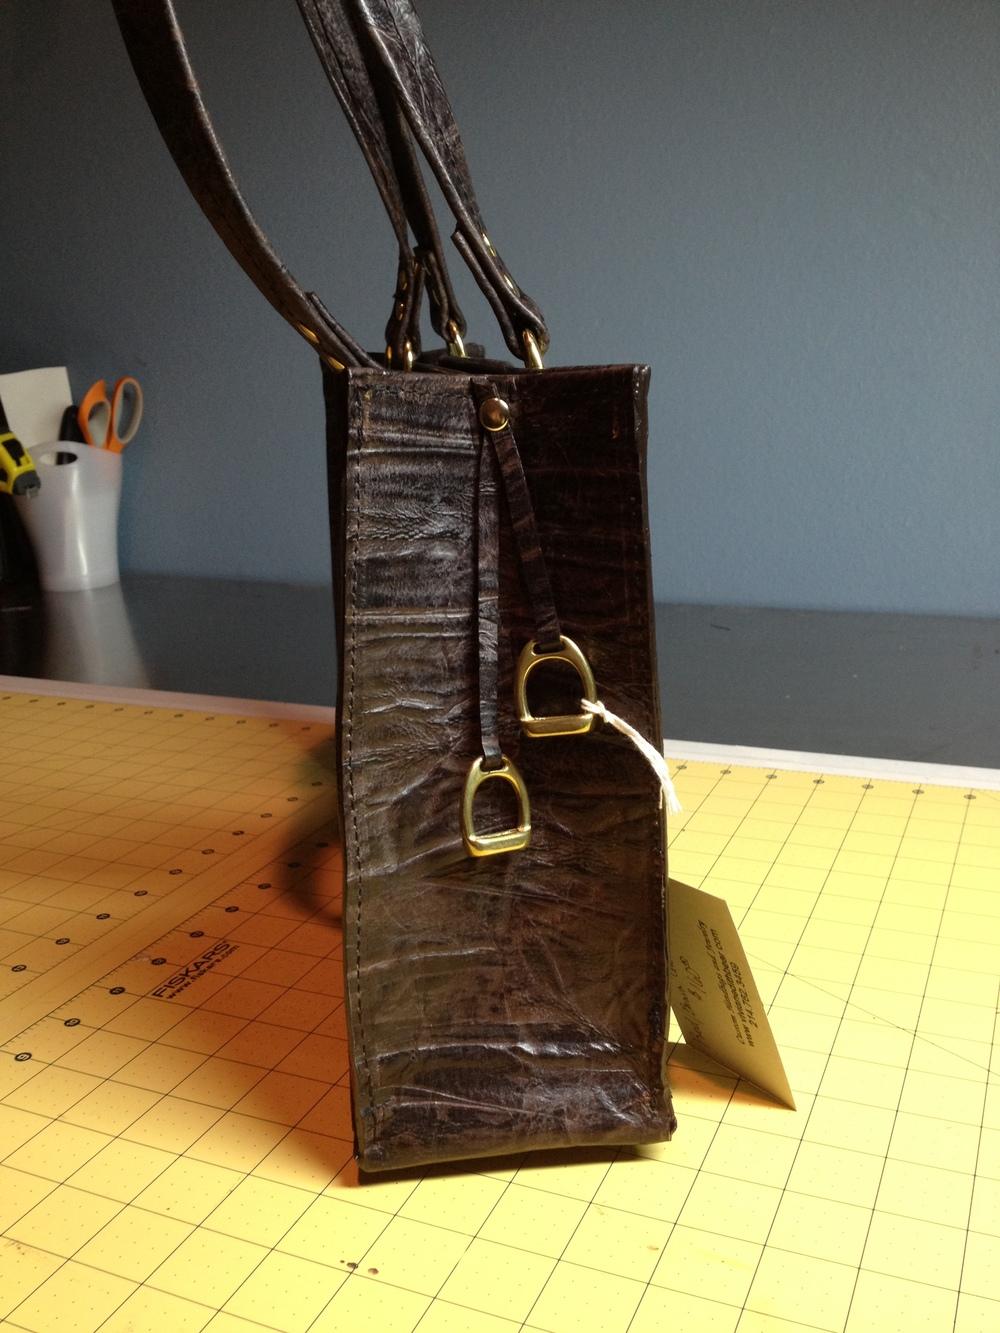 Equestrian style Handbag-side view